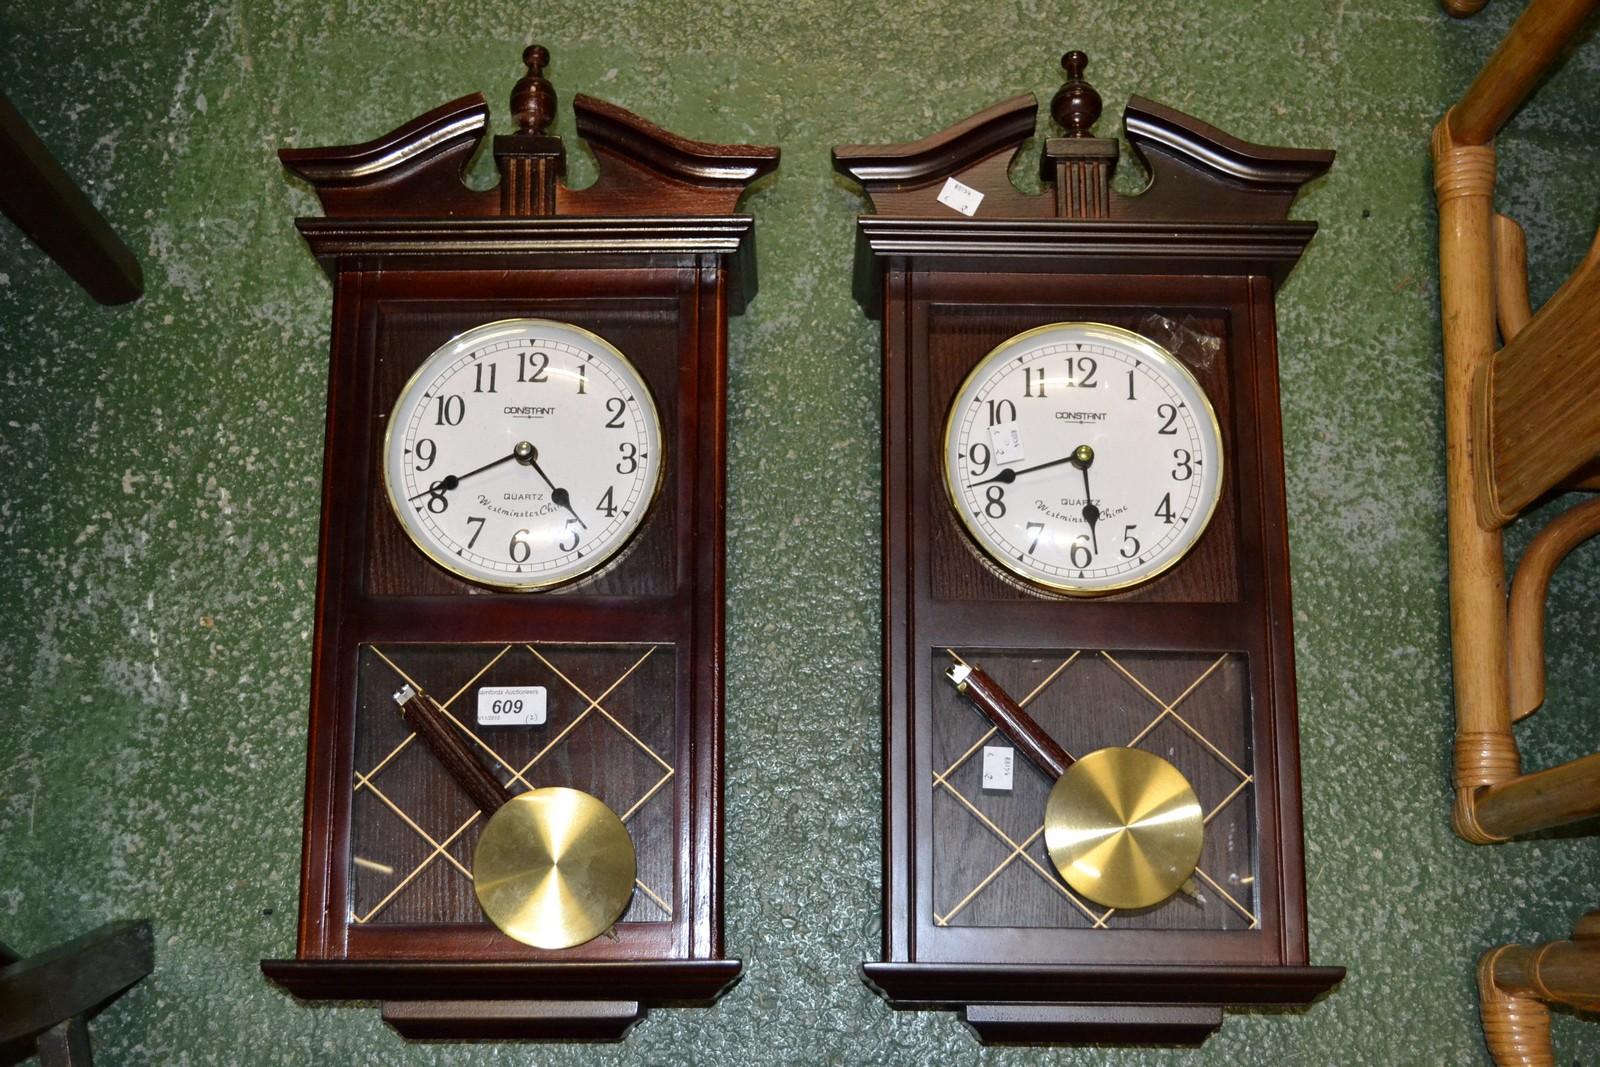 Lot 609 A Pair Of Constant Quartz Westminster Chime Wall Clocks